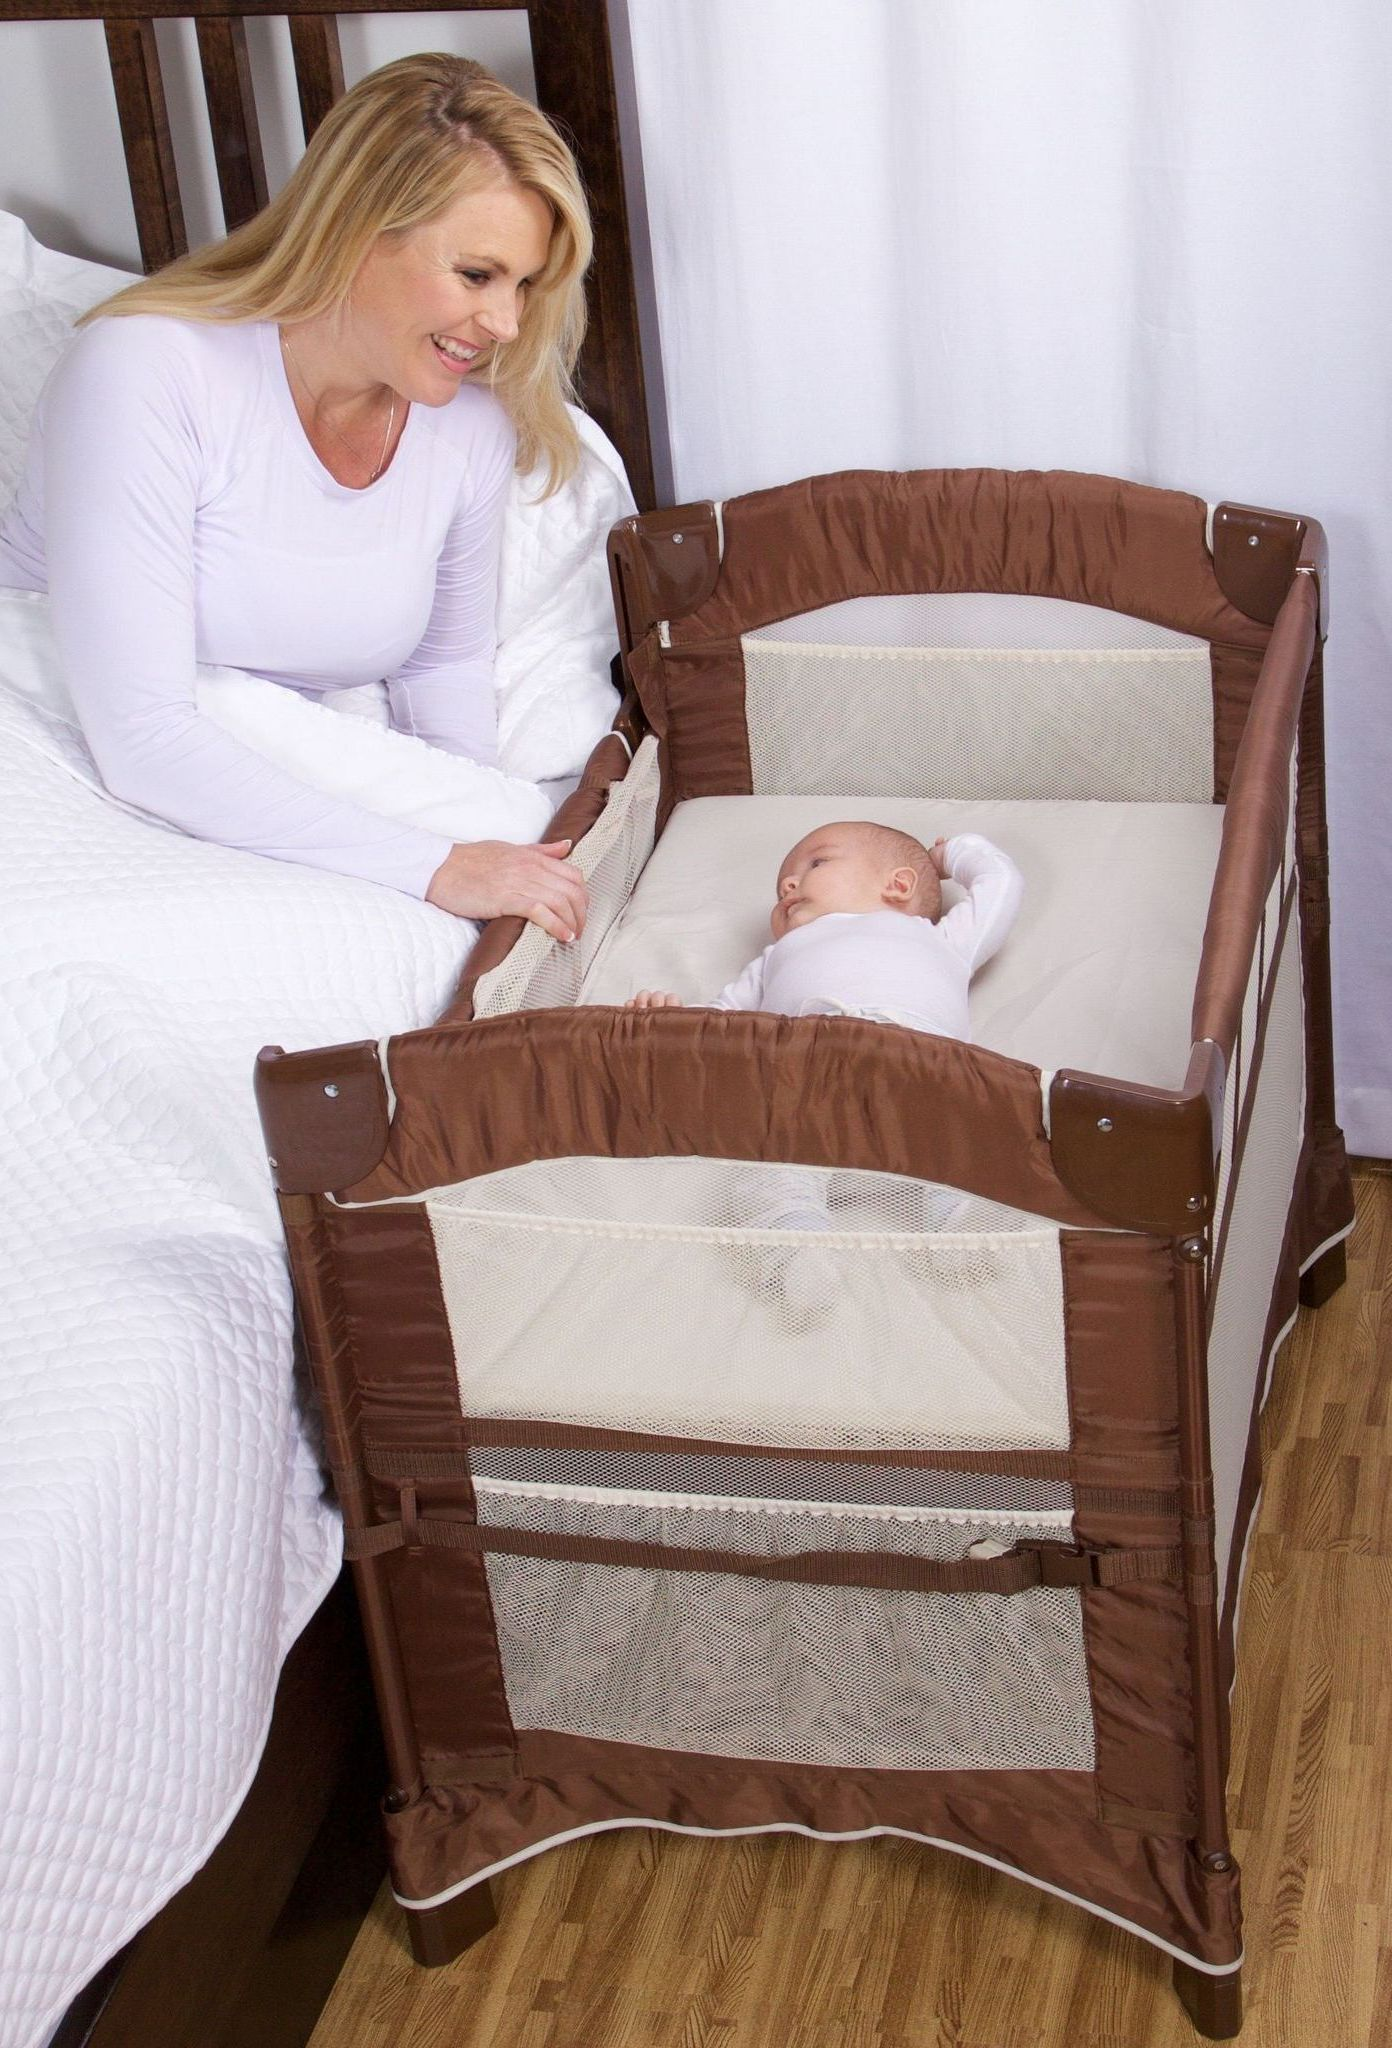 5 Best Baby Bedside Sleeper Bassinets Reviewed In 2020 In 2020